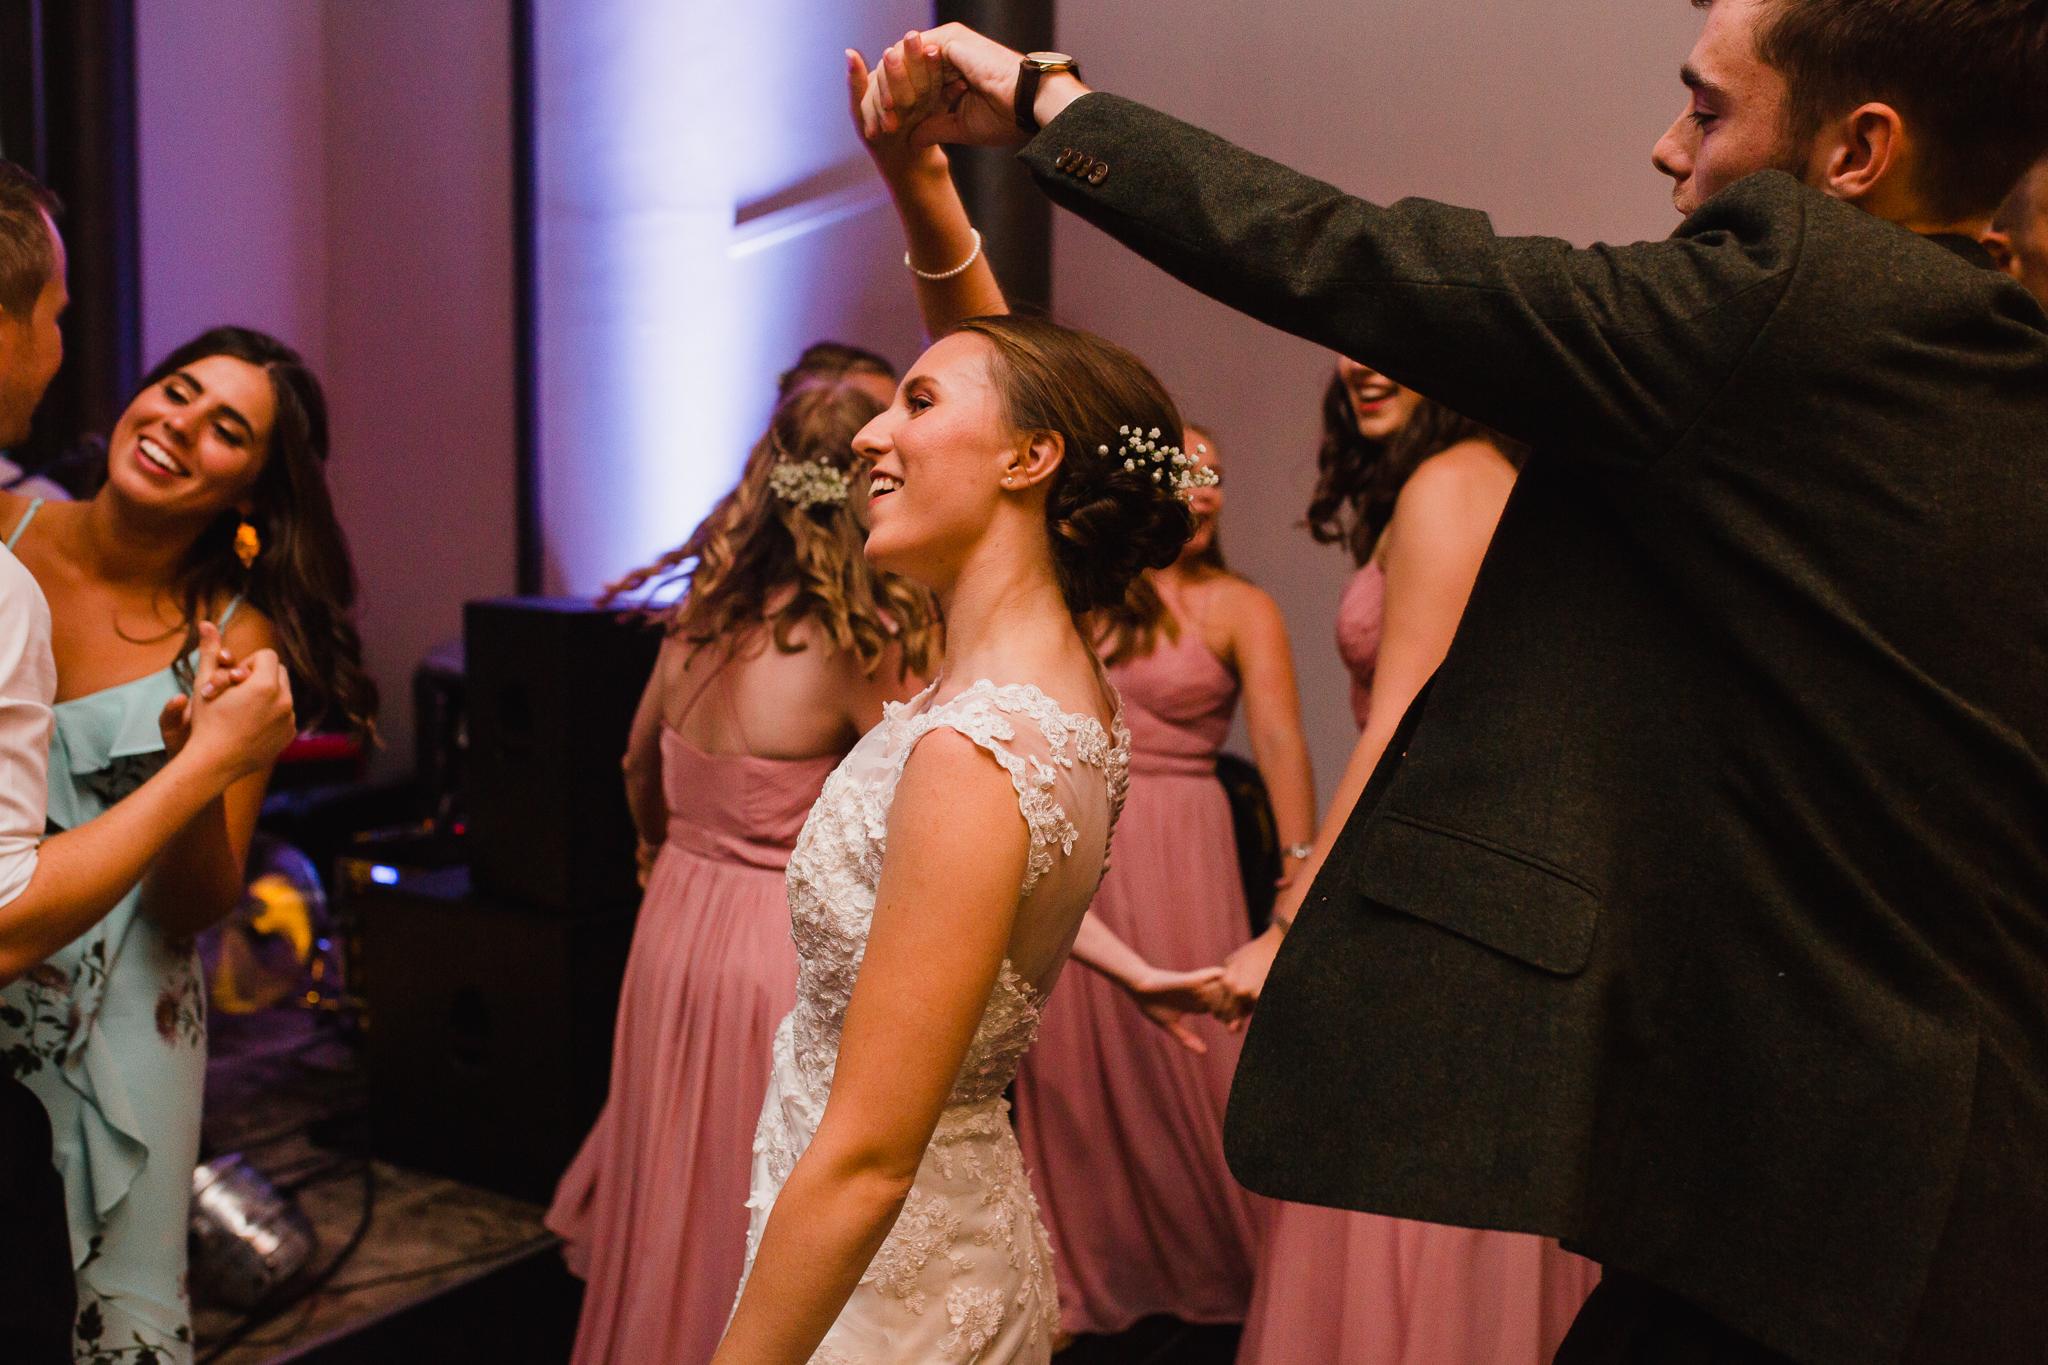 Jess and Ben - Liverpool wedding - first dance